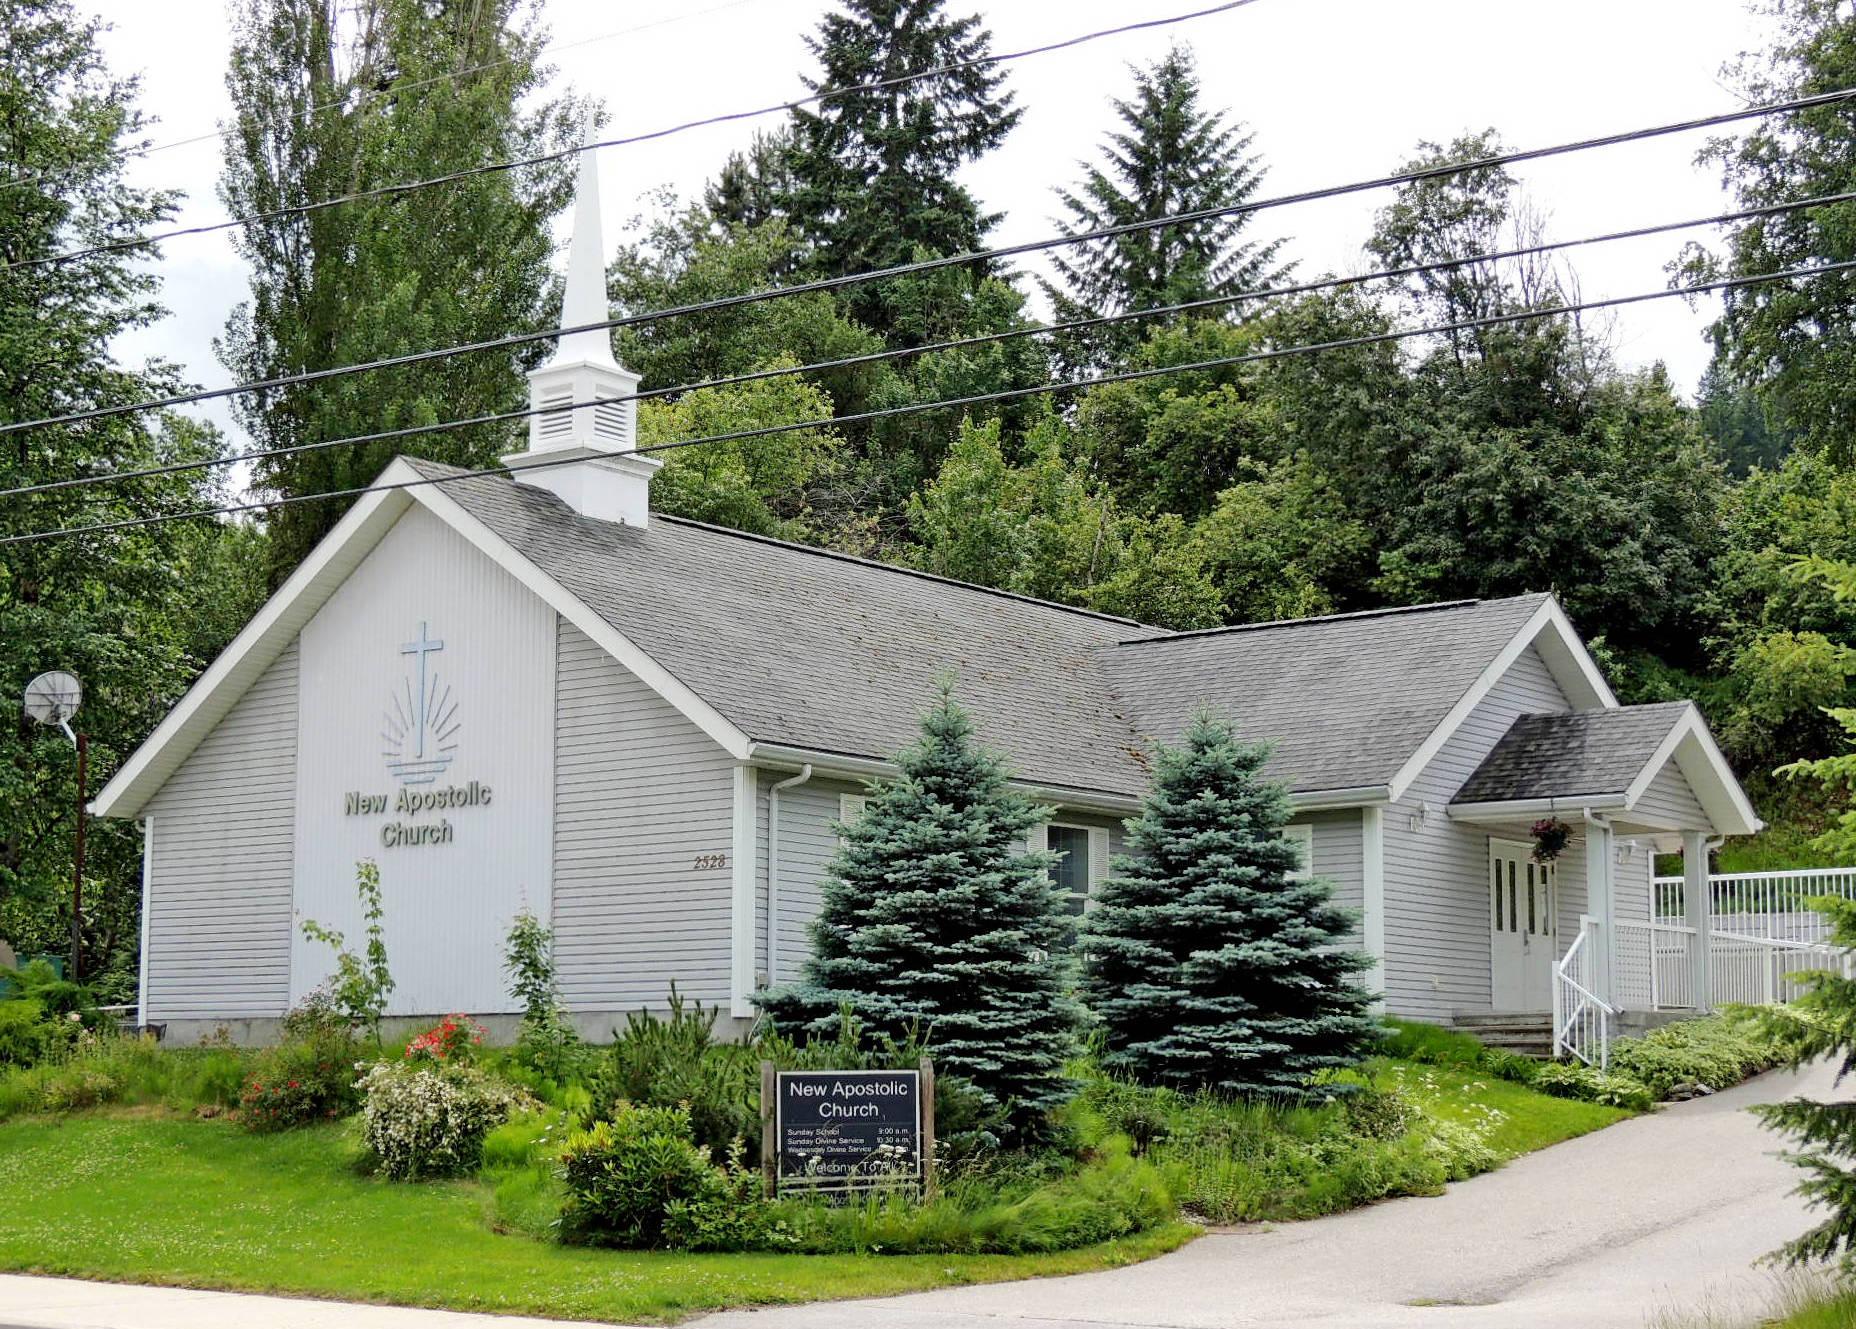 New Apostolic Church Photo